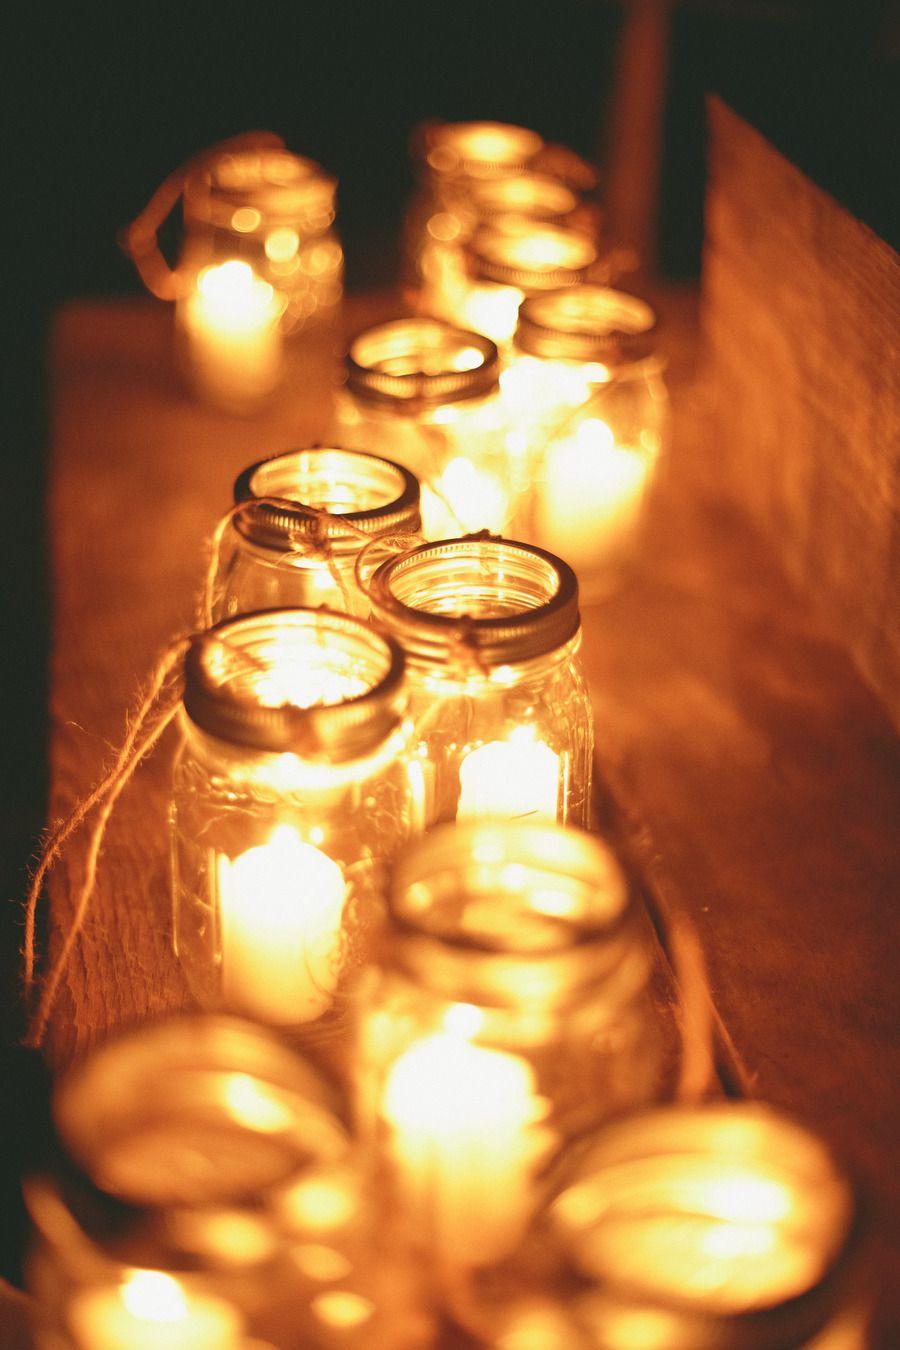 Cozy Union Hill Inn Wedding Union Hill Inn Wedding Union Hill Inn Cozy Candles